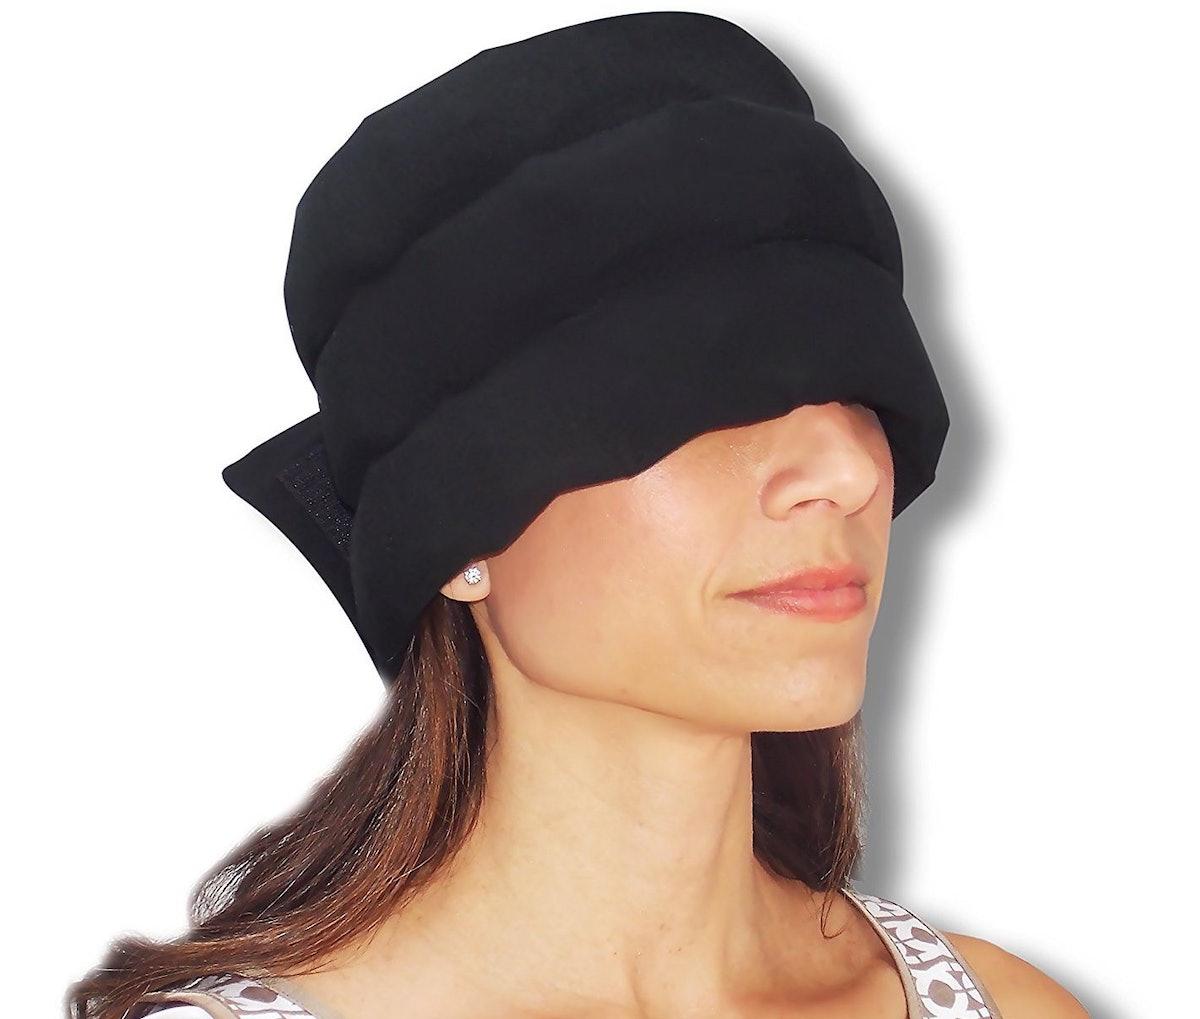 The Original Headache Hat Wearable Ice Pack